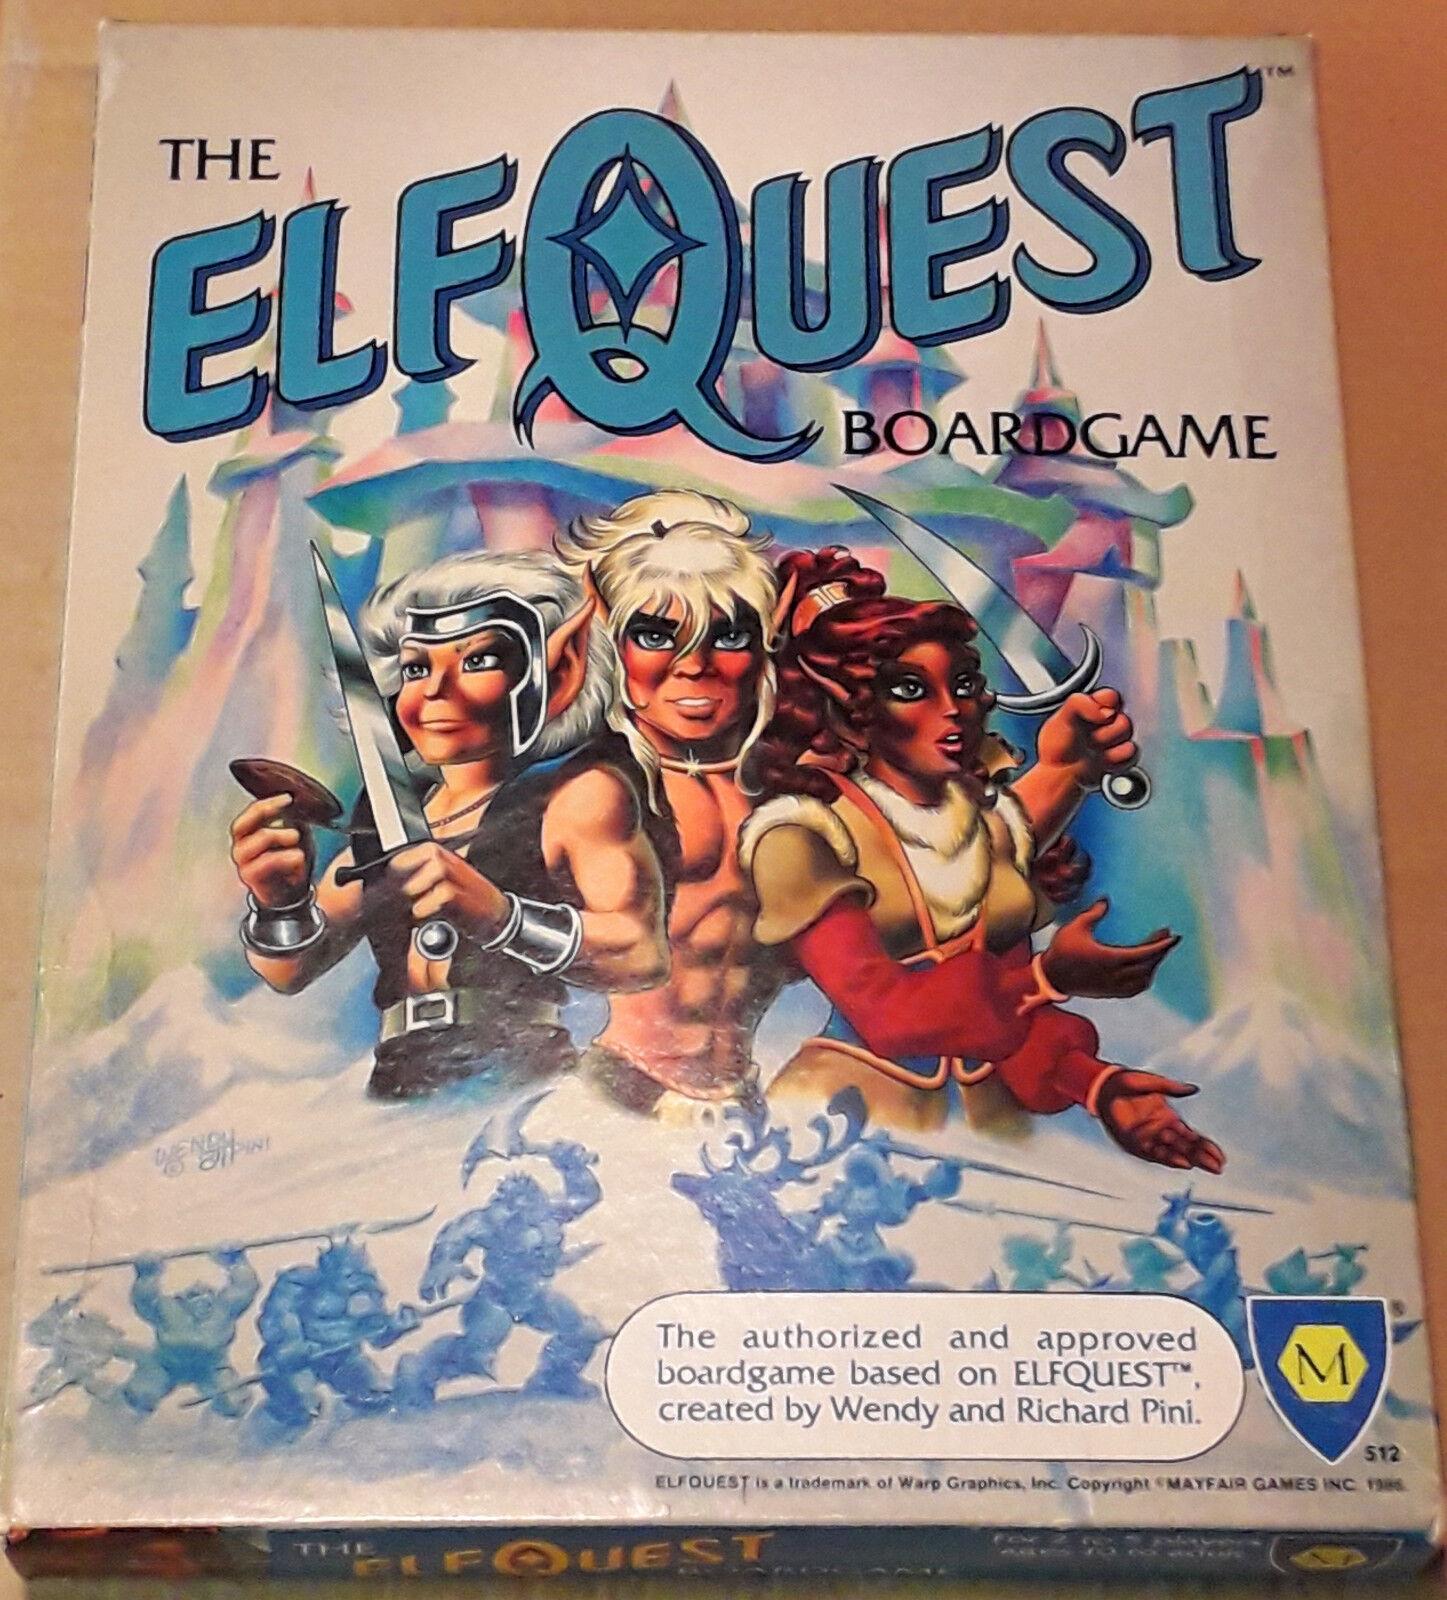 Mayfair 1986 The ElfQuest Boardgame Unplayed & complete Wendy Pini Warp Graphics